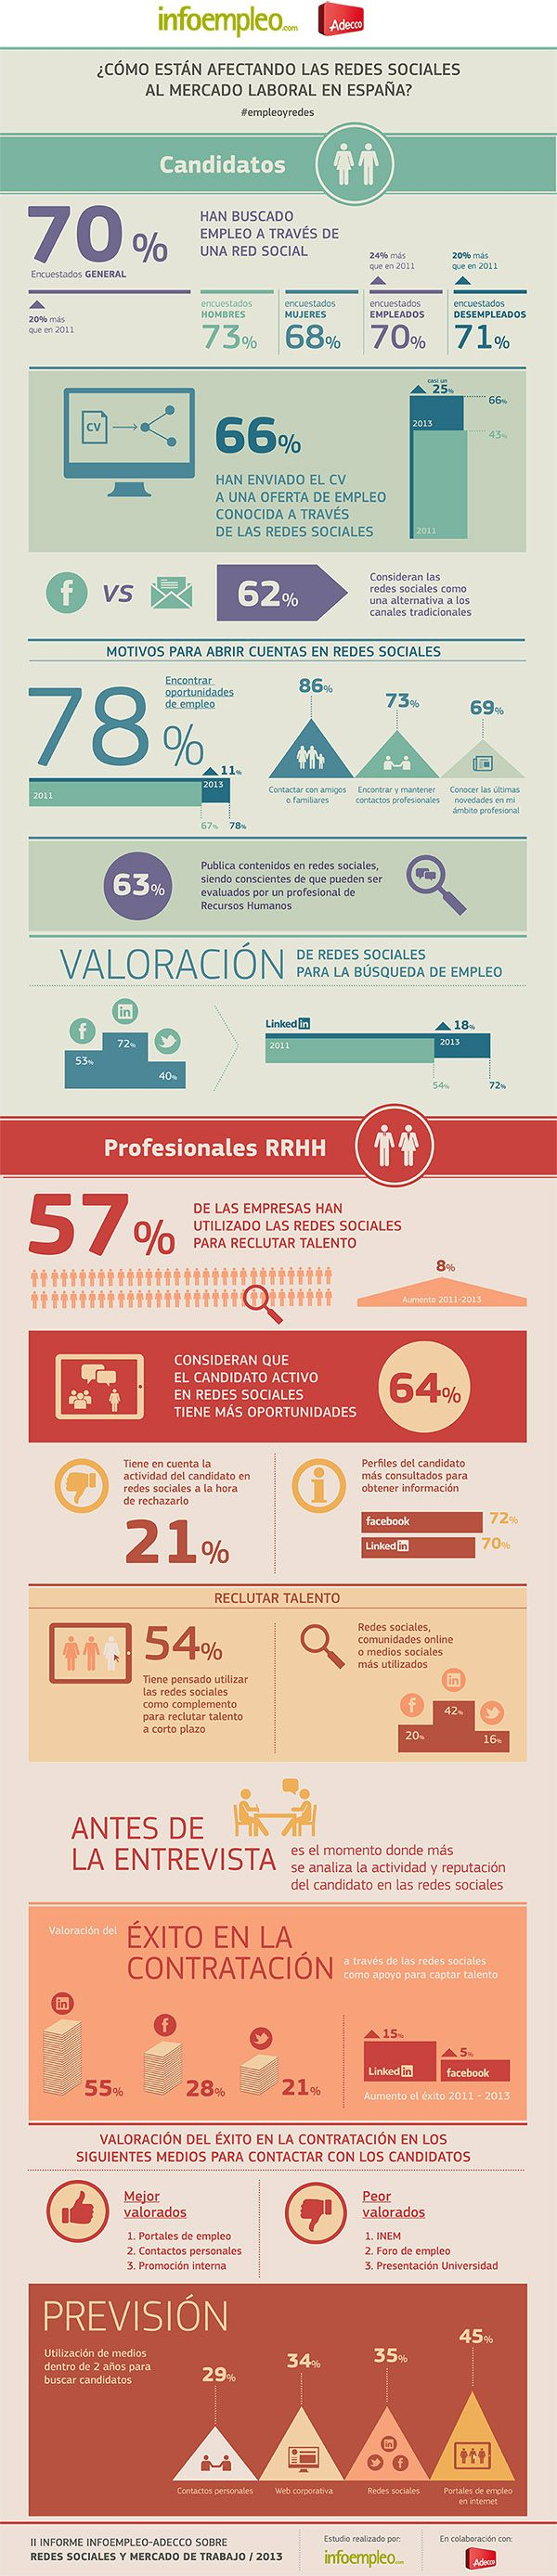 Infografía sobre II informe Infoempleo-Adecco  sobre #EmpleoyRedes 2013